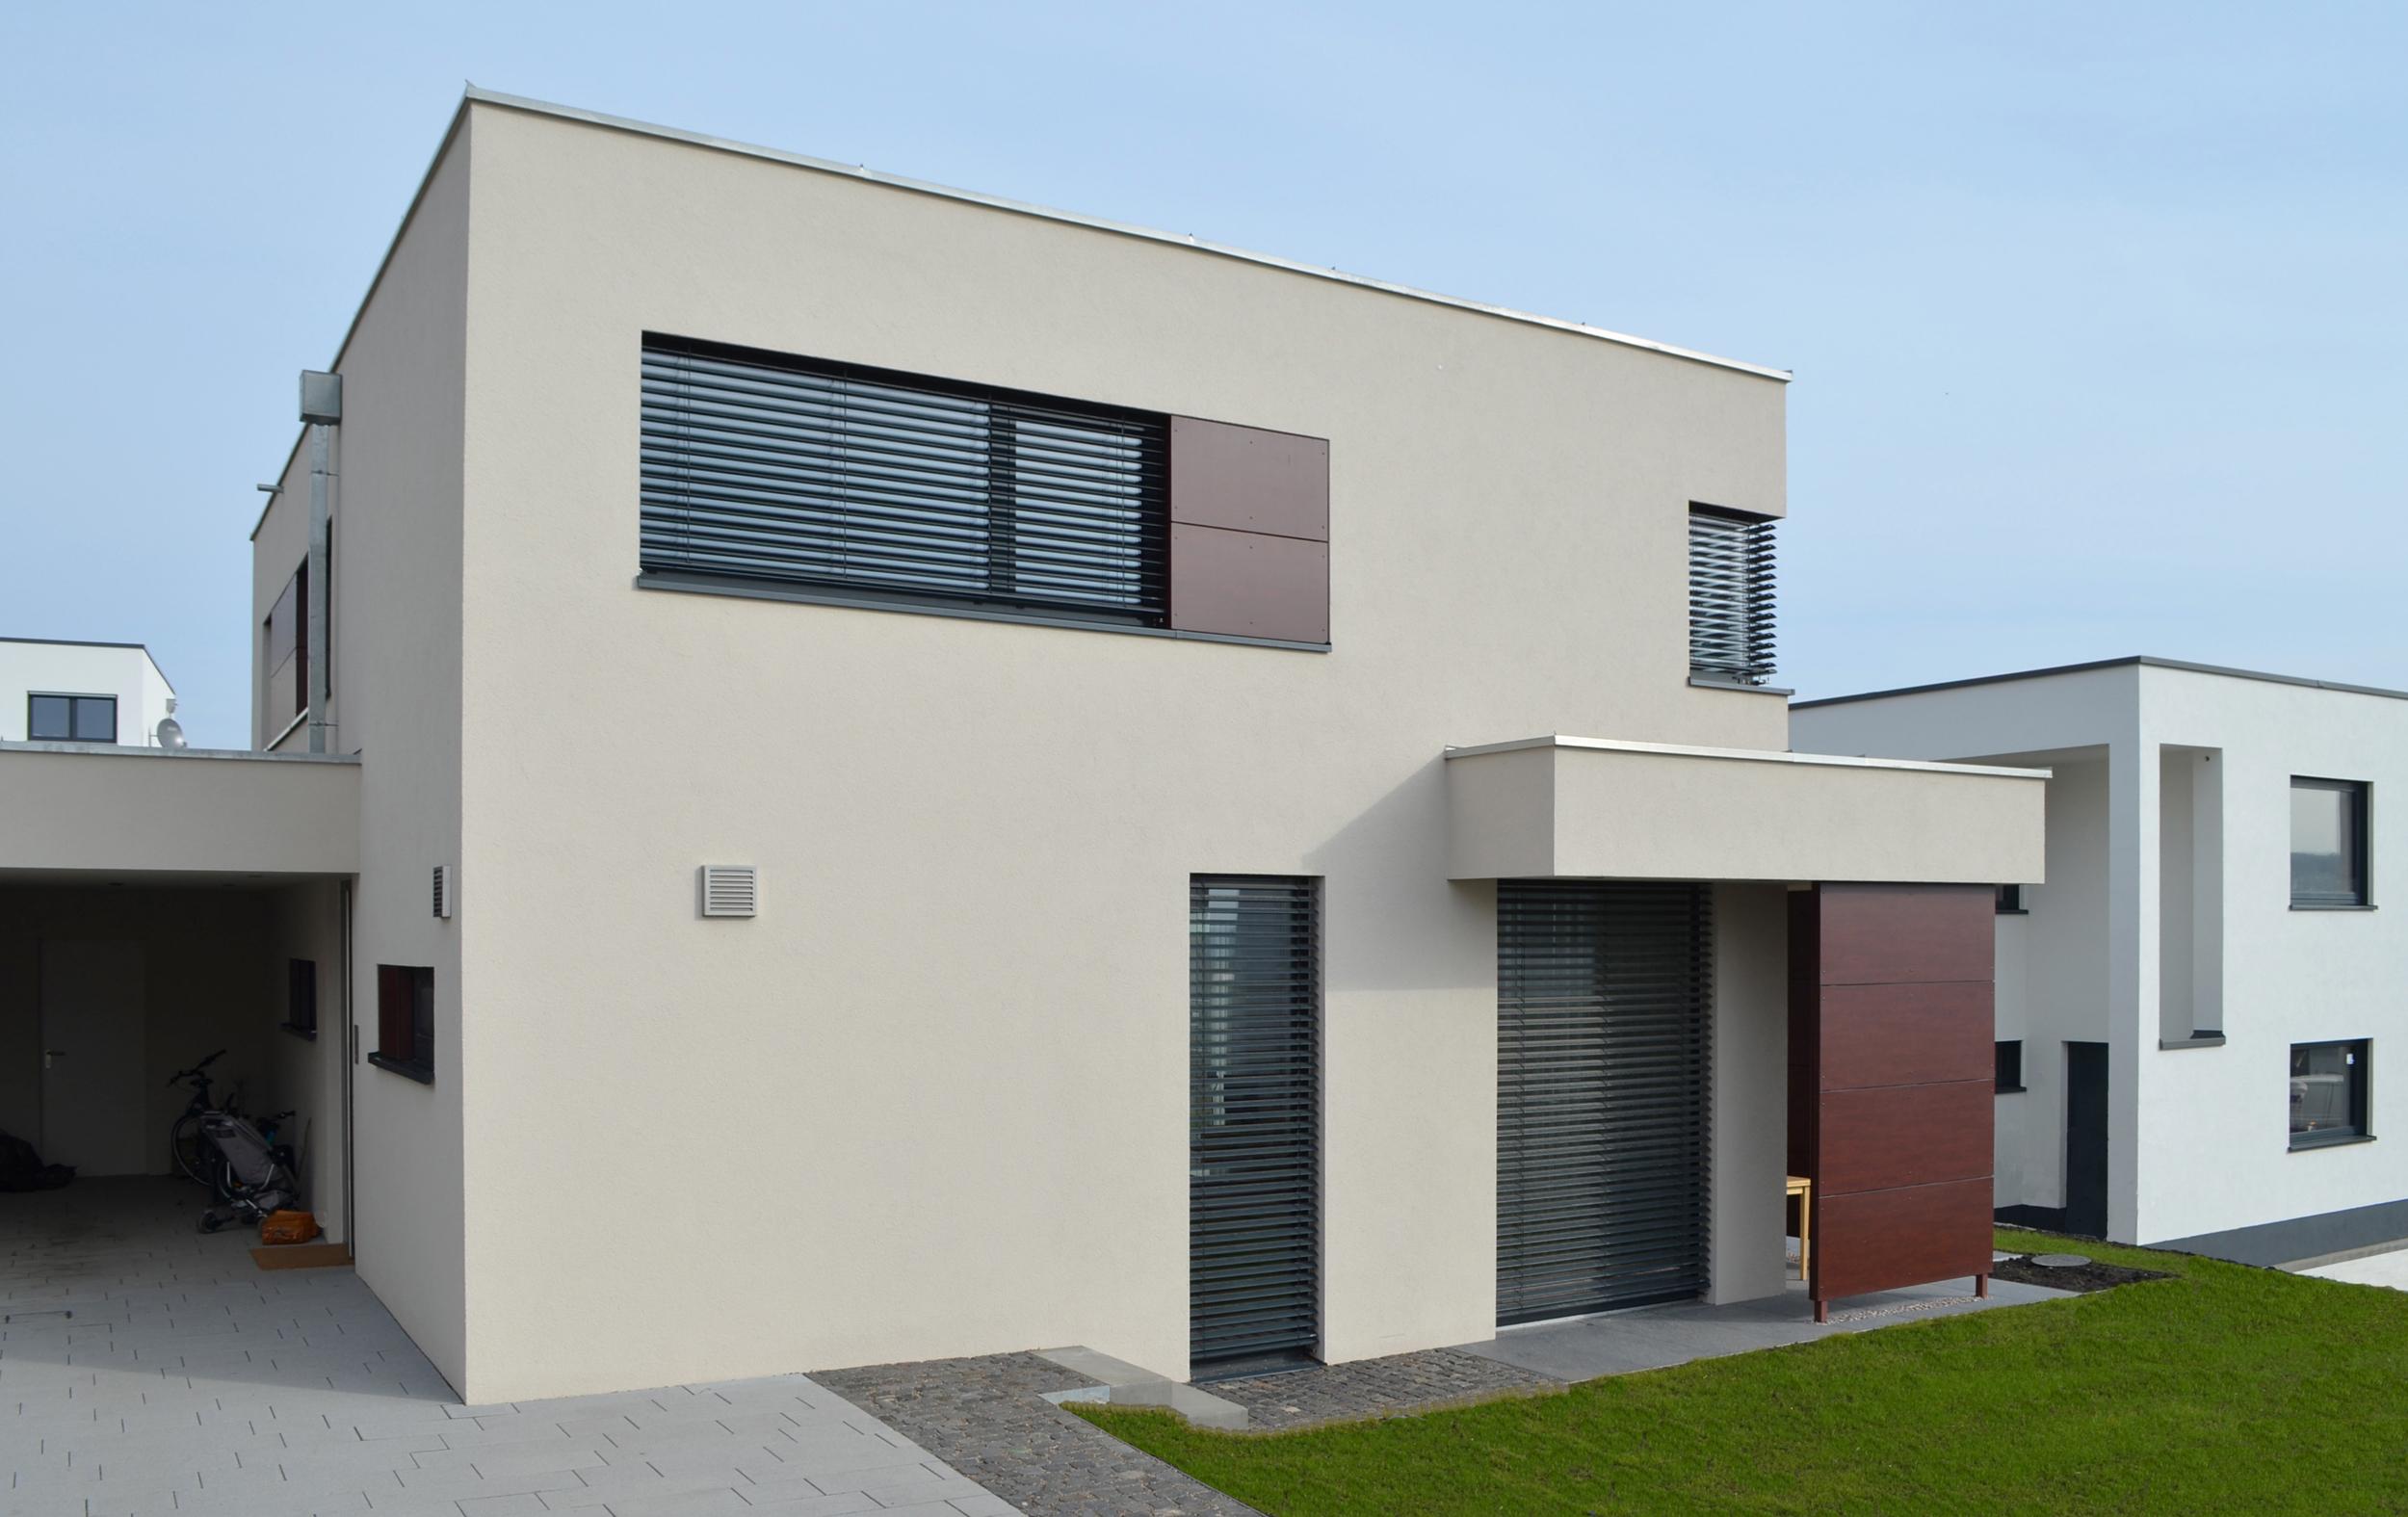 neubau einfamilienhaus kr erfurt architekturf hrer. Black Bedroom Furniture Sets. Home Design Ideas